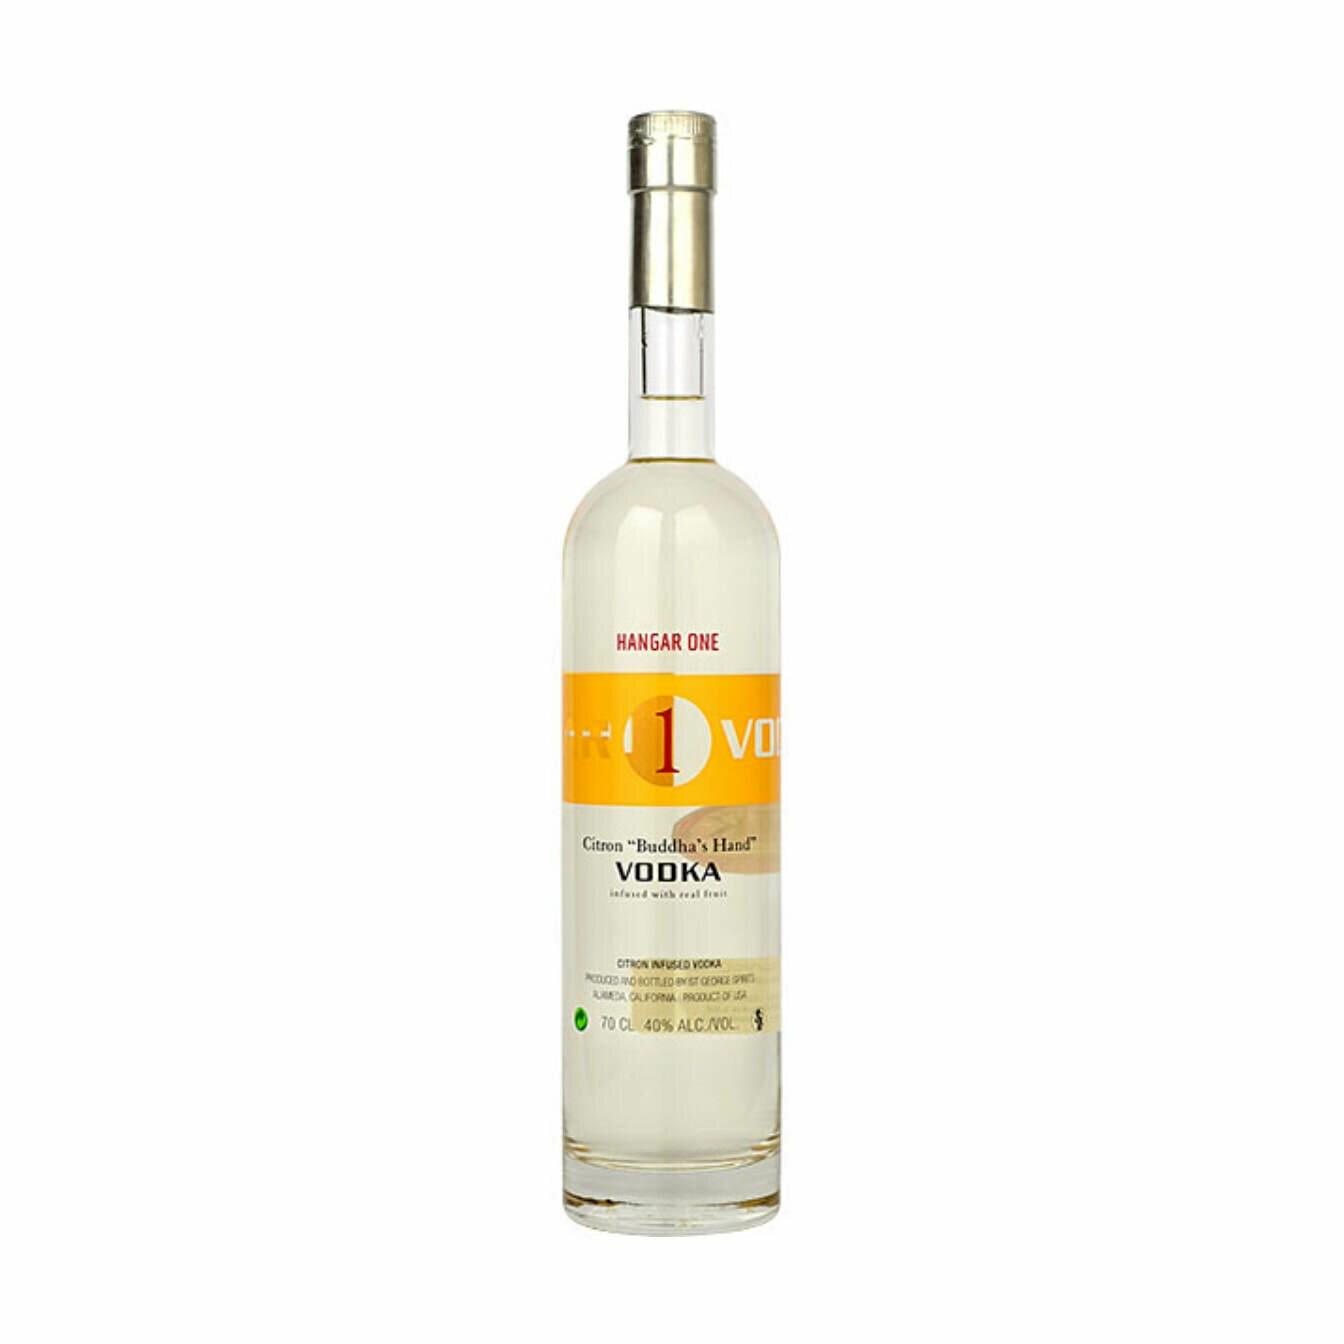 Hangar One Citrus Vodka